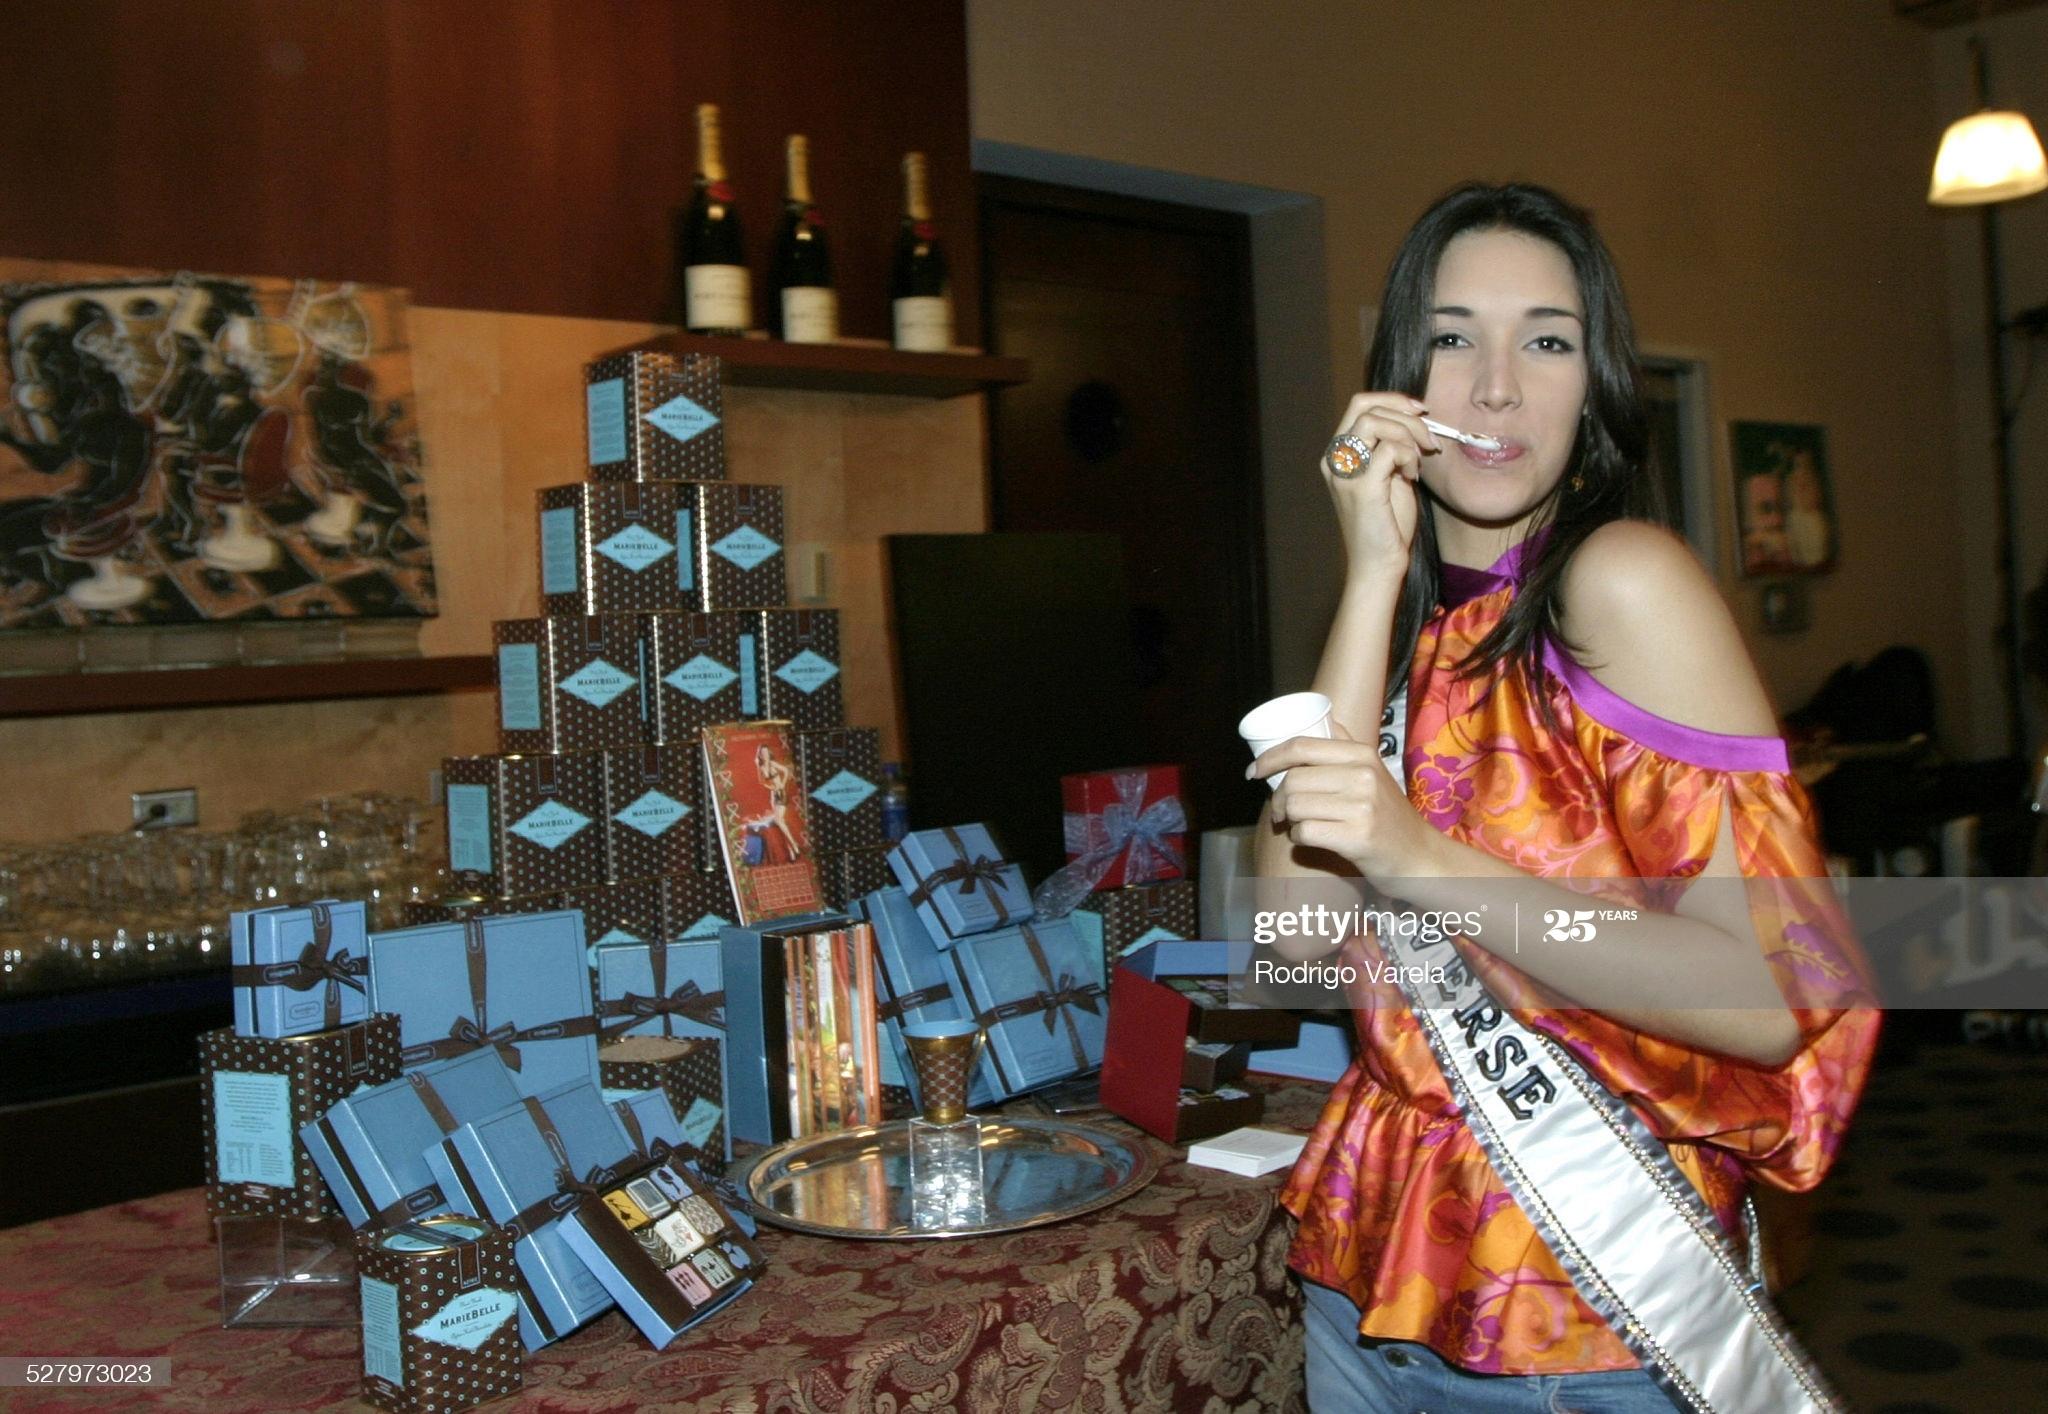 ════ ∘◦❁◦∘ ════ Amelia Vega, Miss Universe 2003. ════ ∘◦❁◦∘ ════ - Página 11 Miss-u47